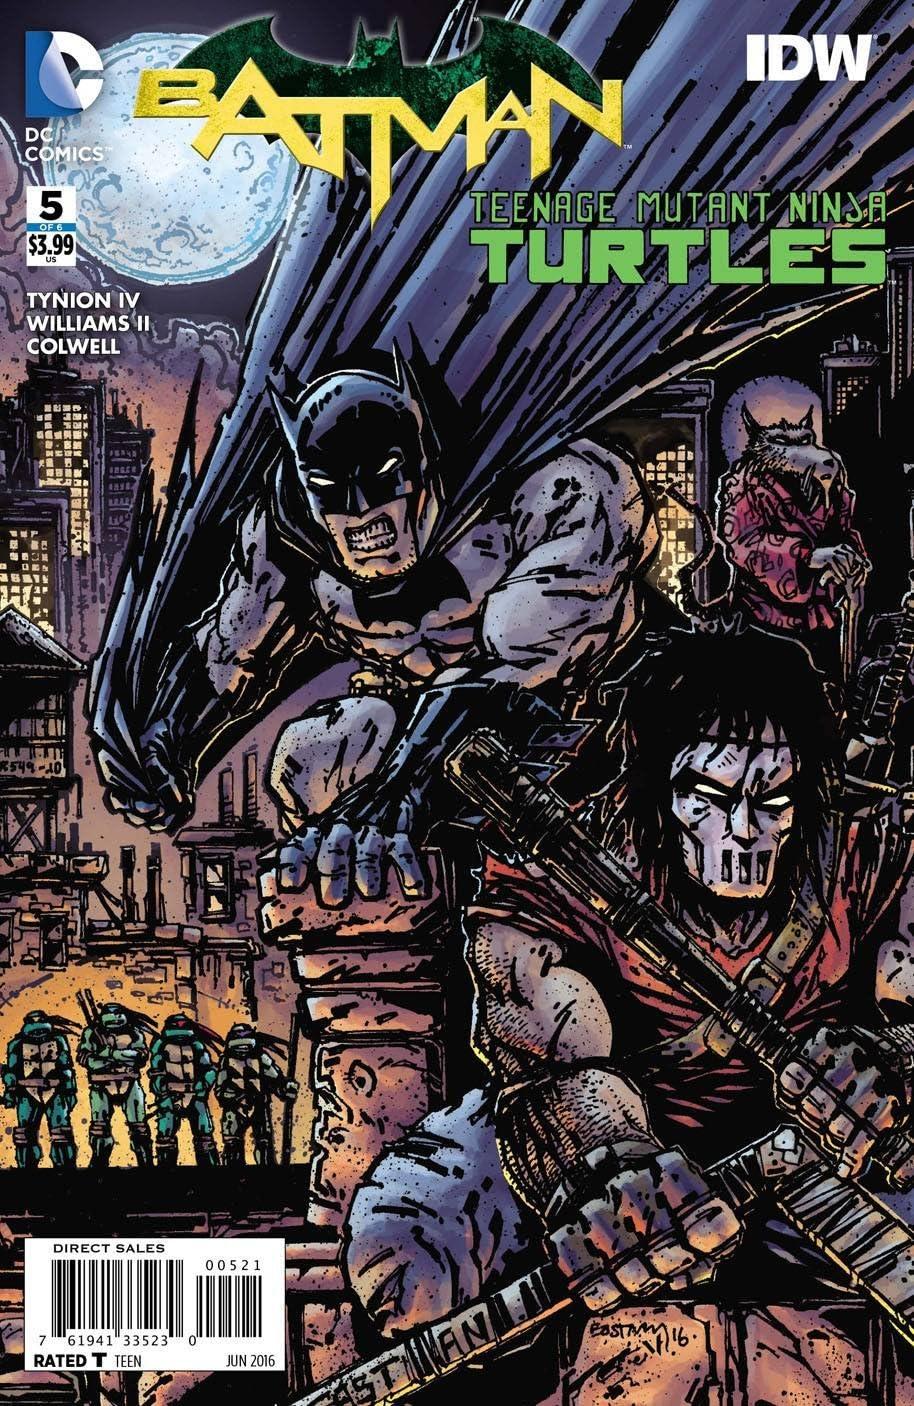 Amazon.com : Batman Teenage Mutant Ninja Turtles #5 (Eastman ...